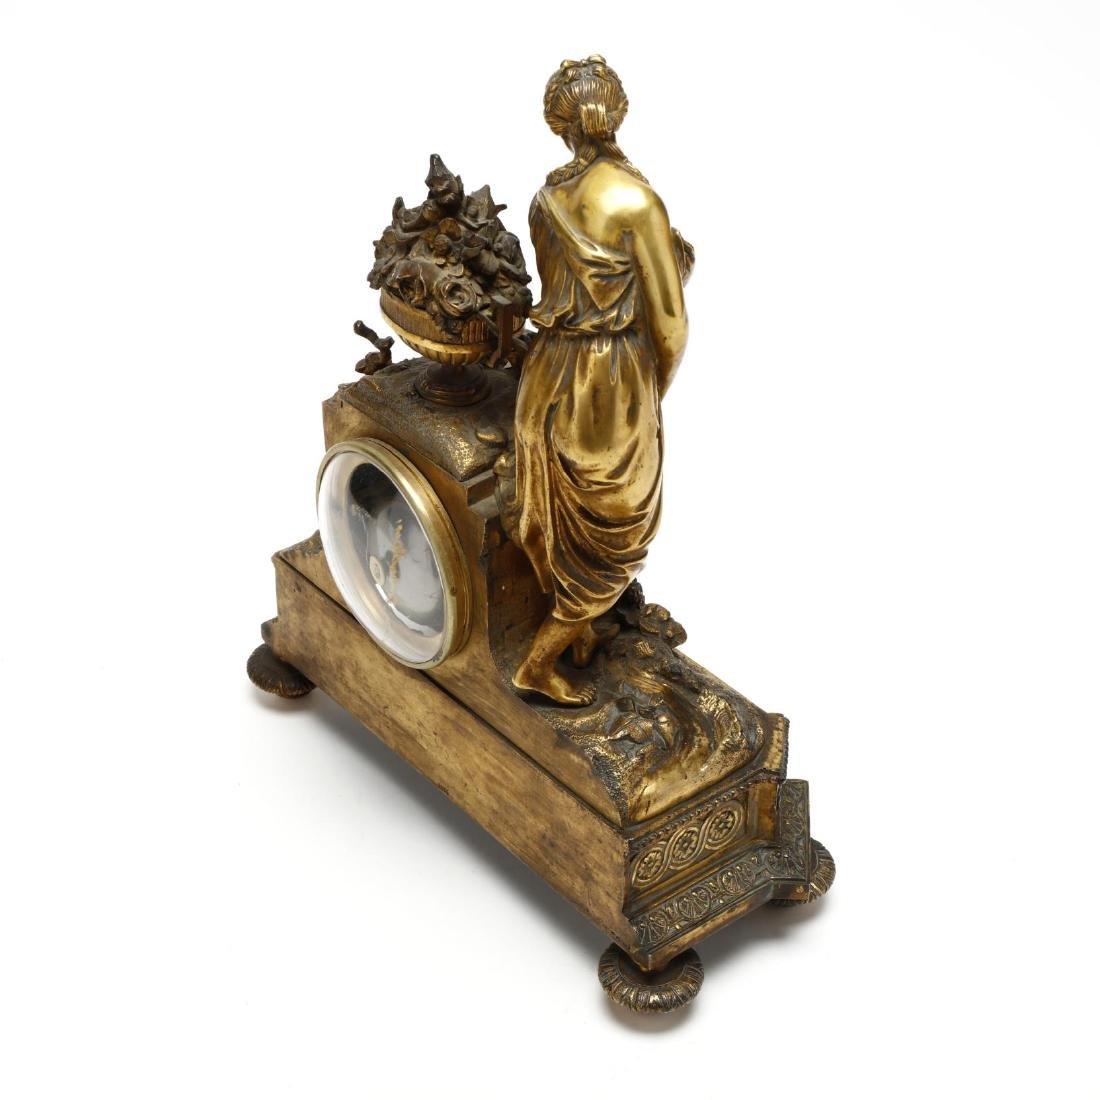 Antique French Gilt Bronze Figural Mantel Clock - 6